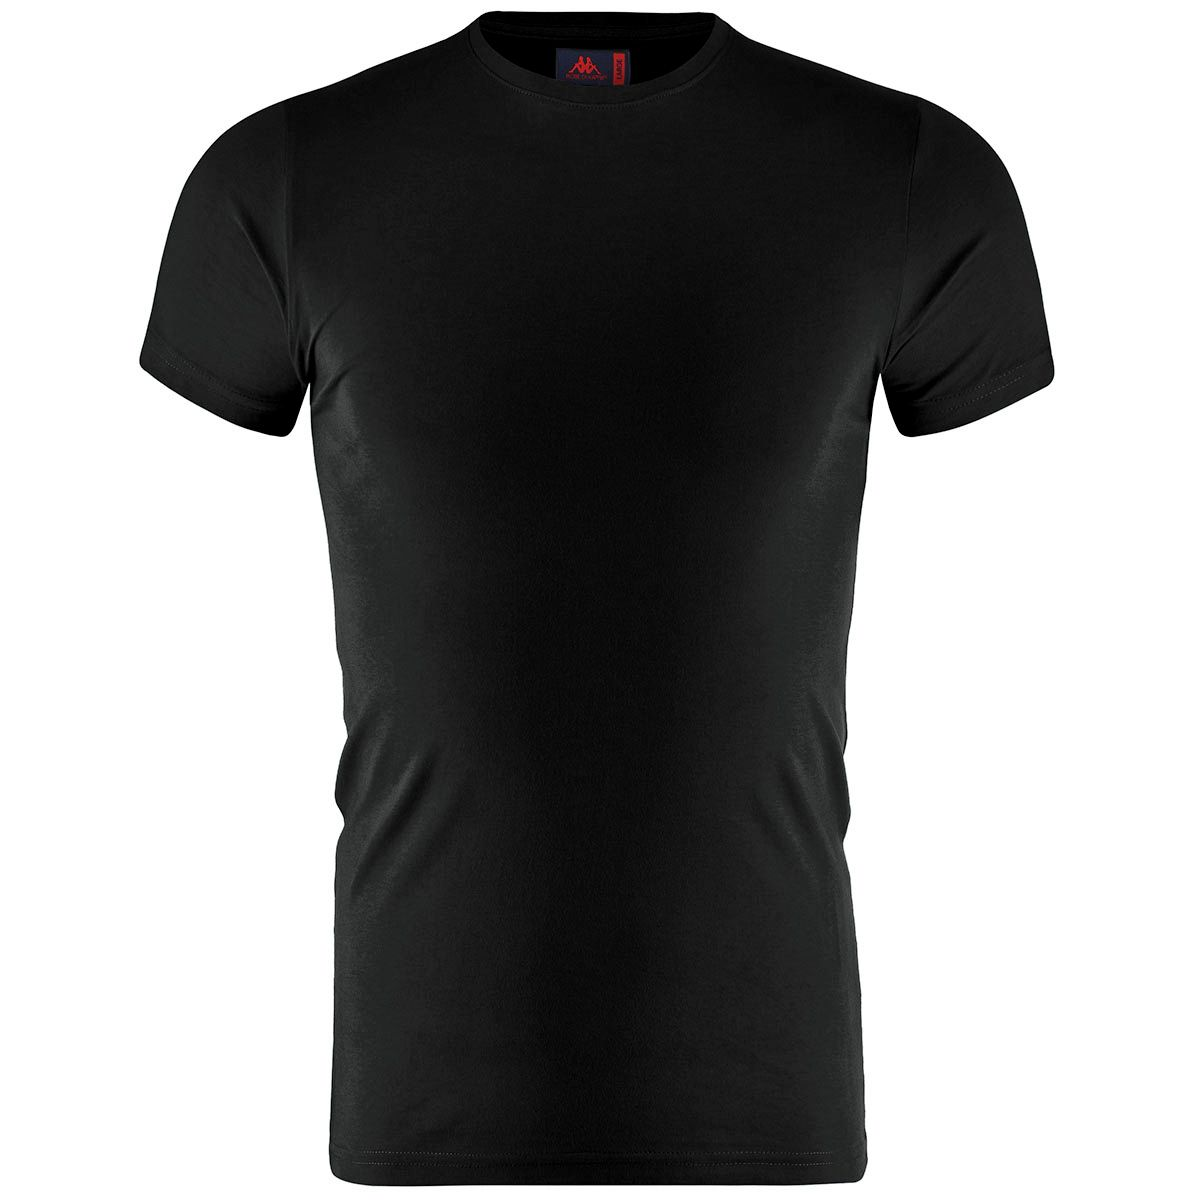 Robe di Kappa T-SHIRTS & TOP KERK Man Classic T-Shirt